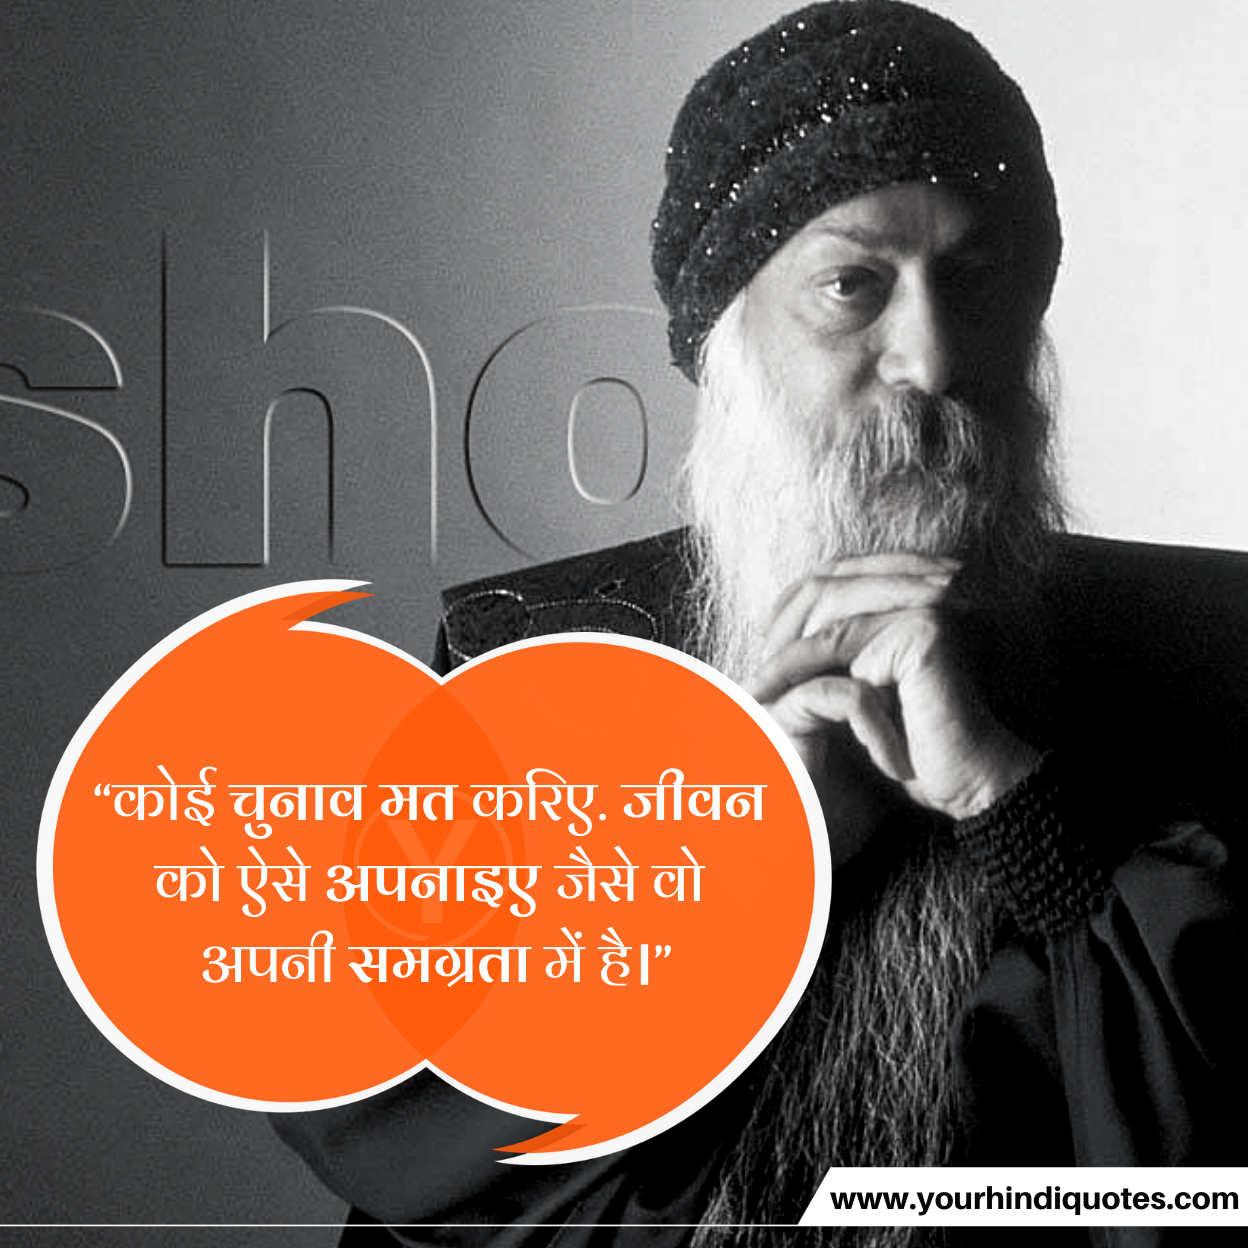 Osho Quotes Image